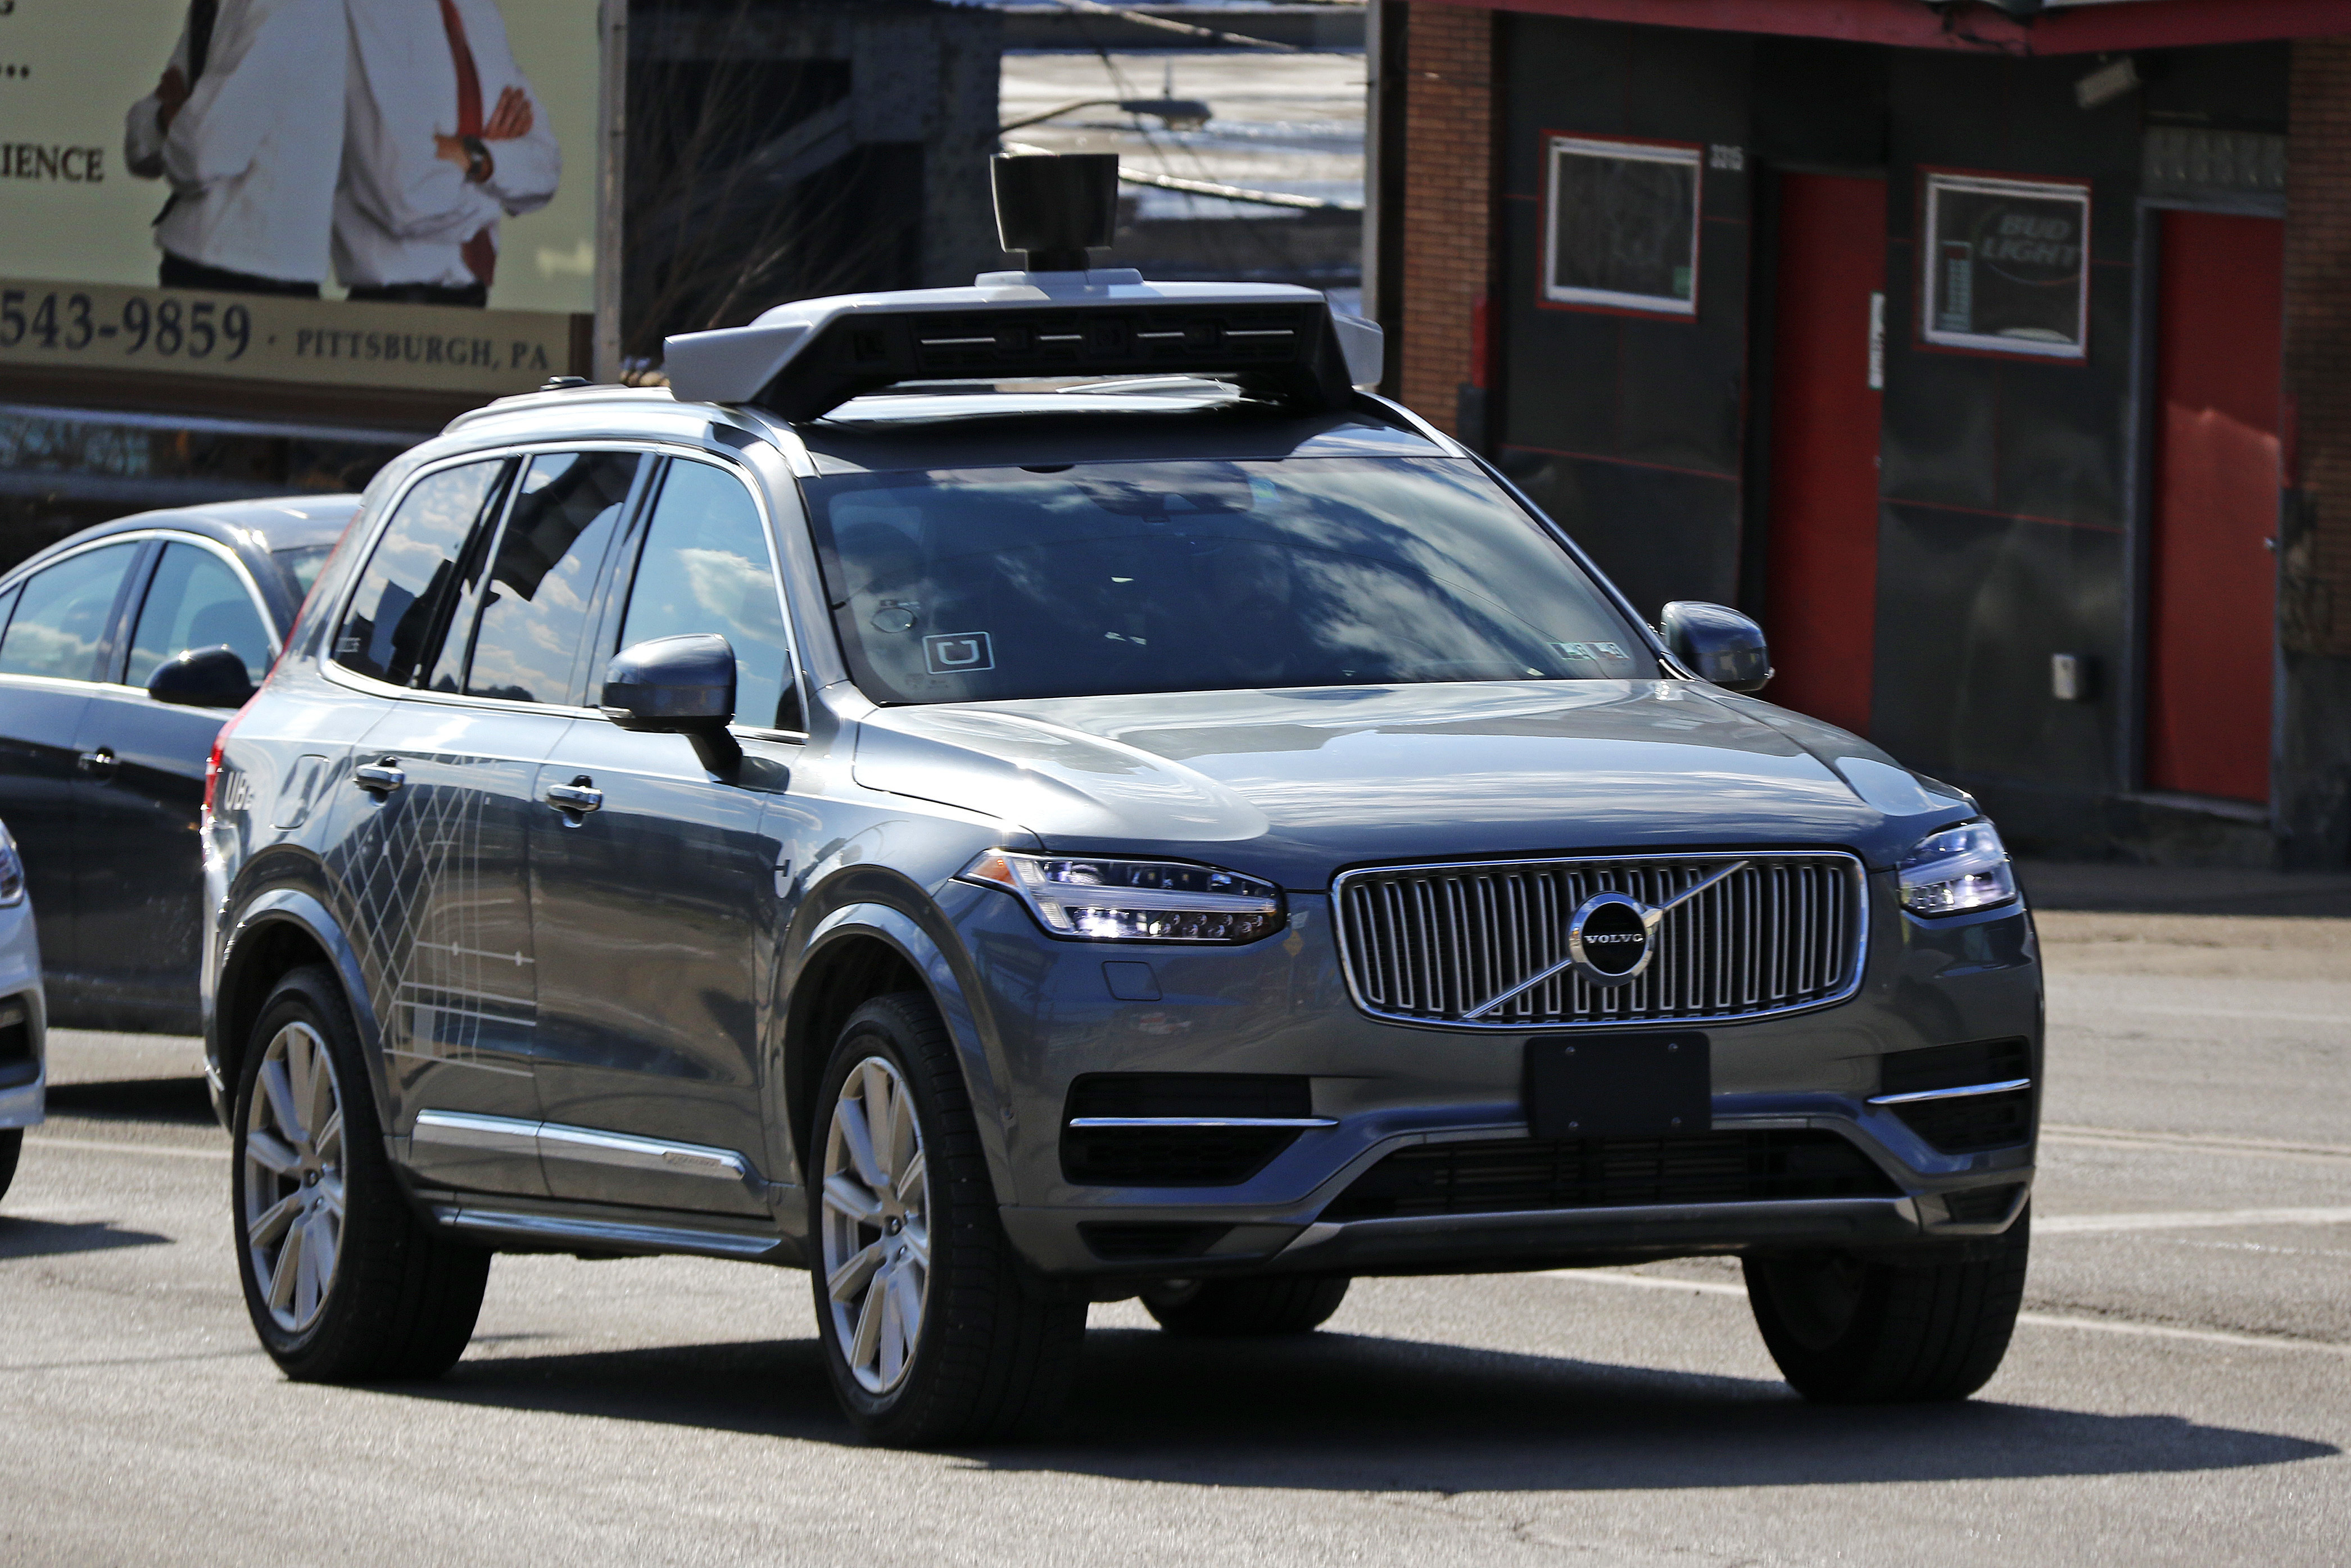 Nine Months After Deadly Crash Uber Is Testing Self Driving Cars